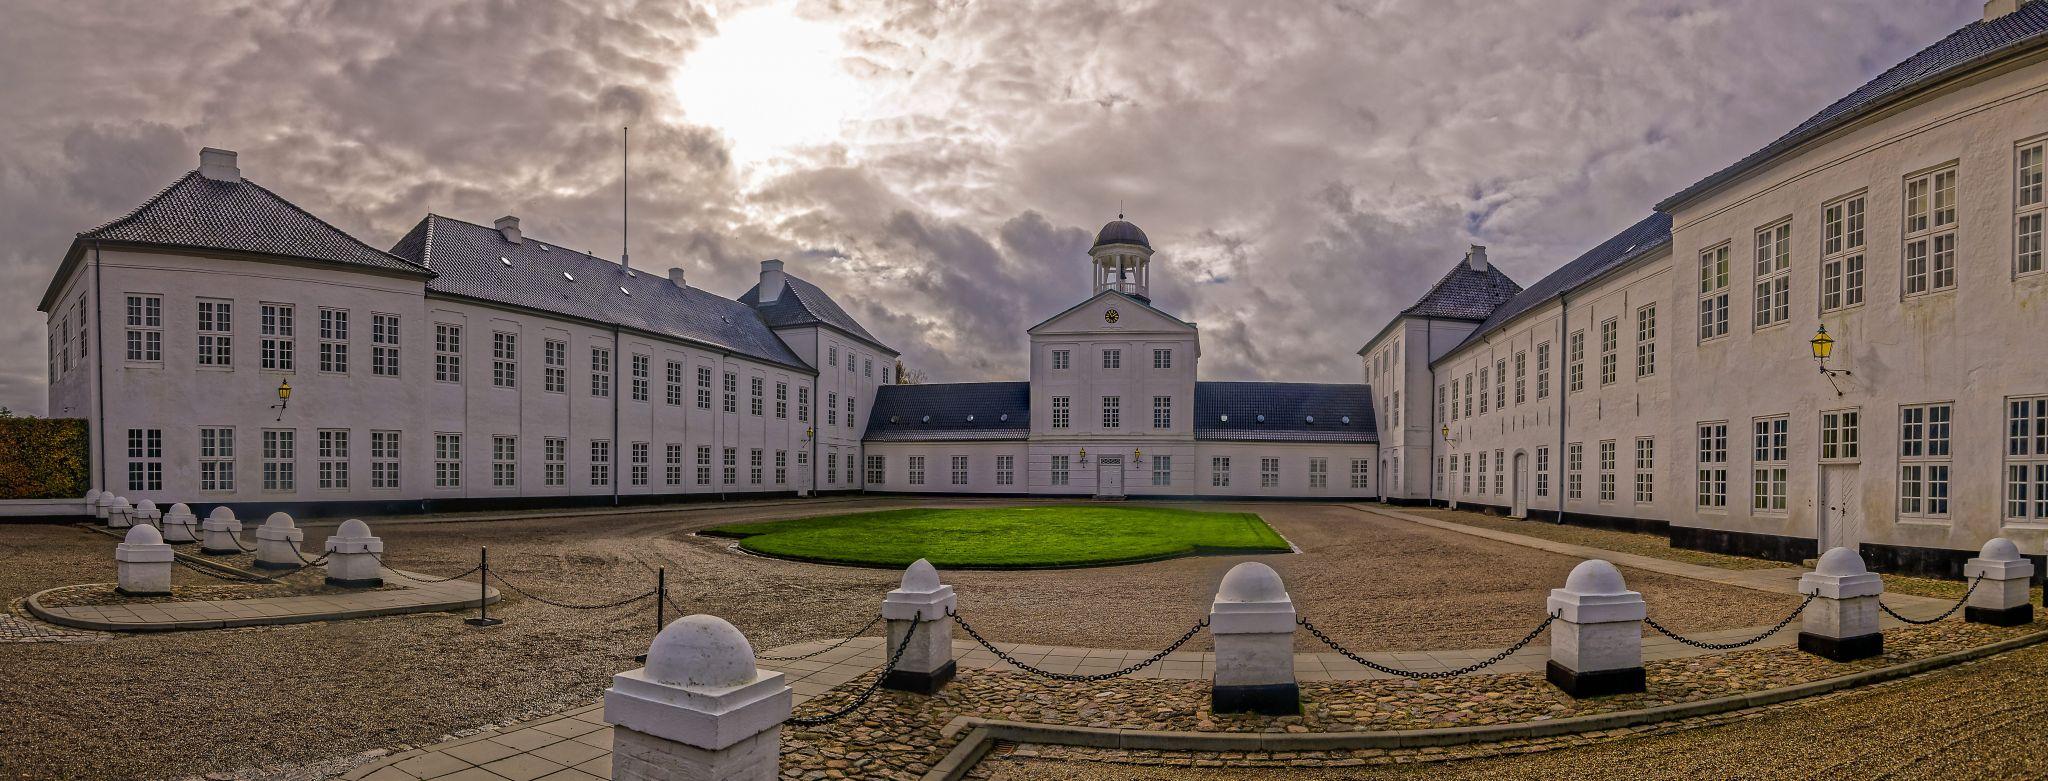 Gråsten castle Danmark, Denmark